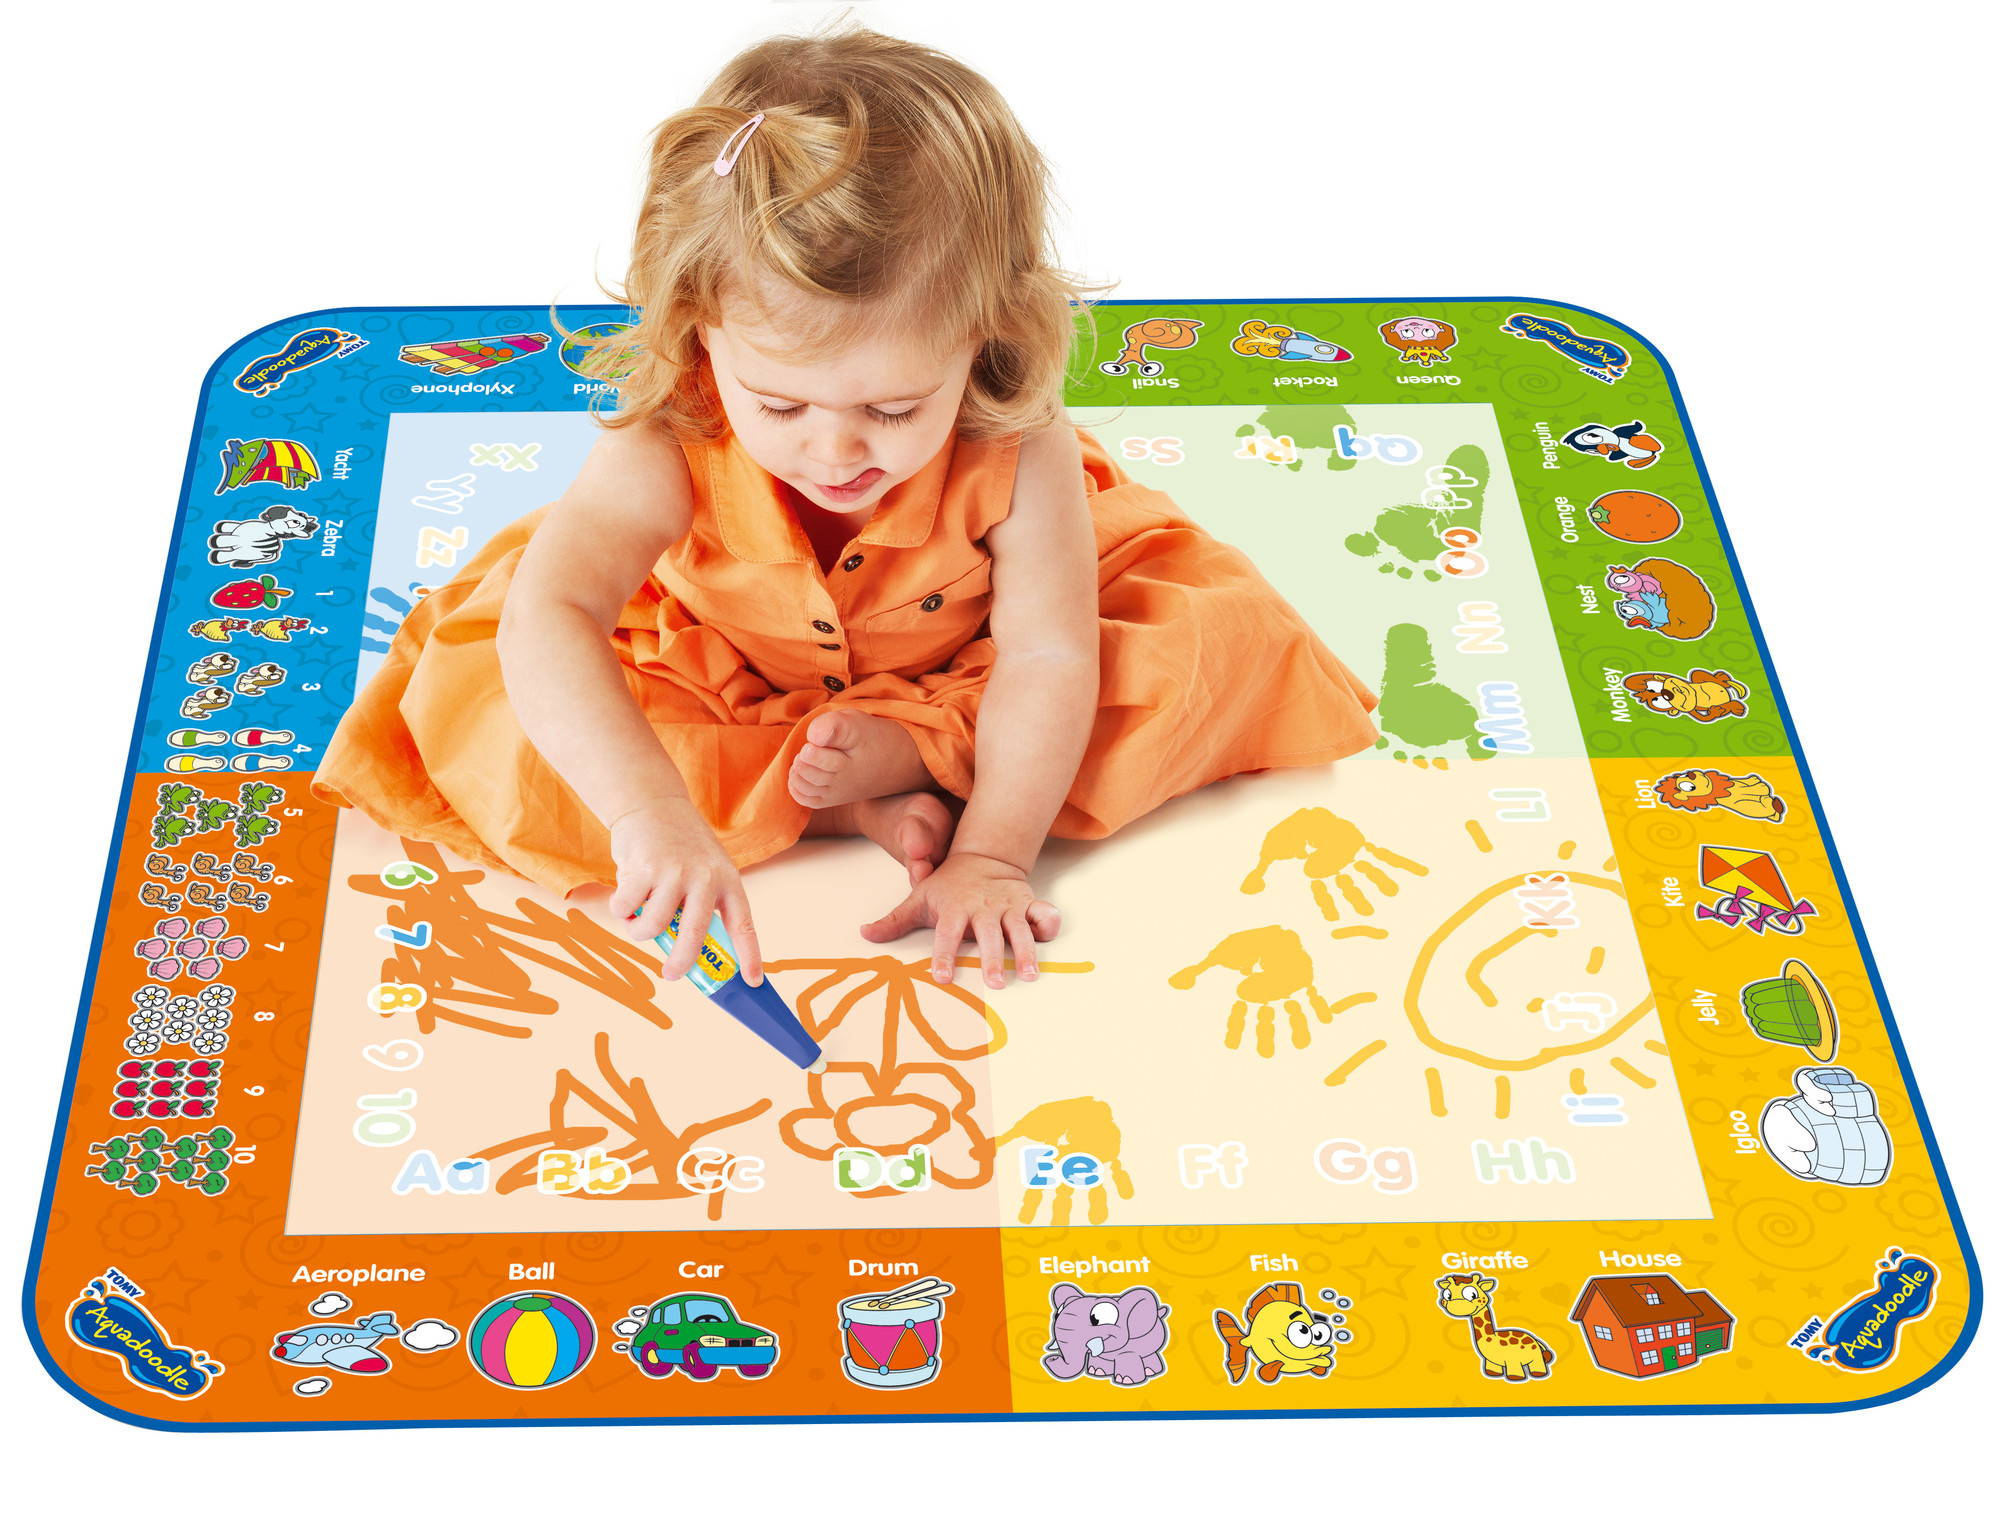 activity rakuten sides children crawling acevog play mat mirage product two playing pad shop mats picnic toddler cushion